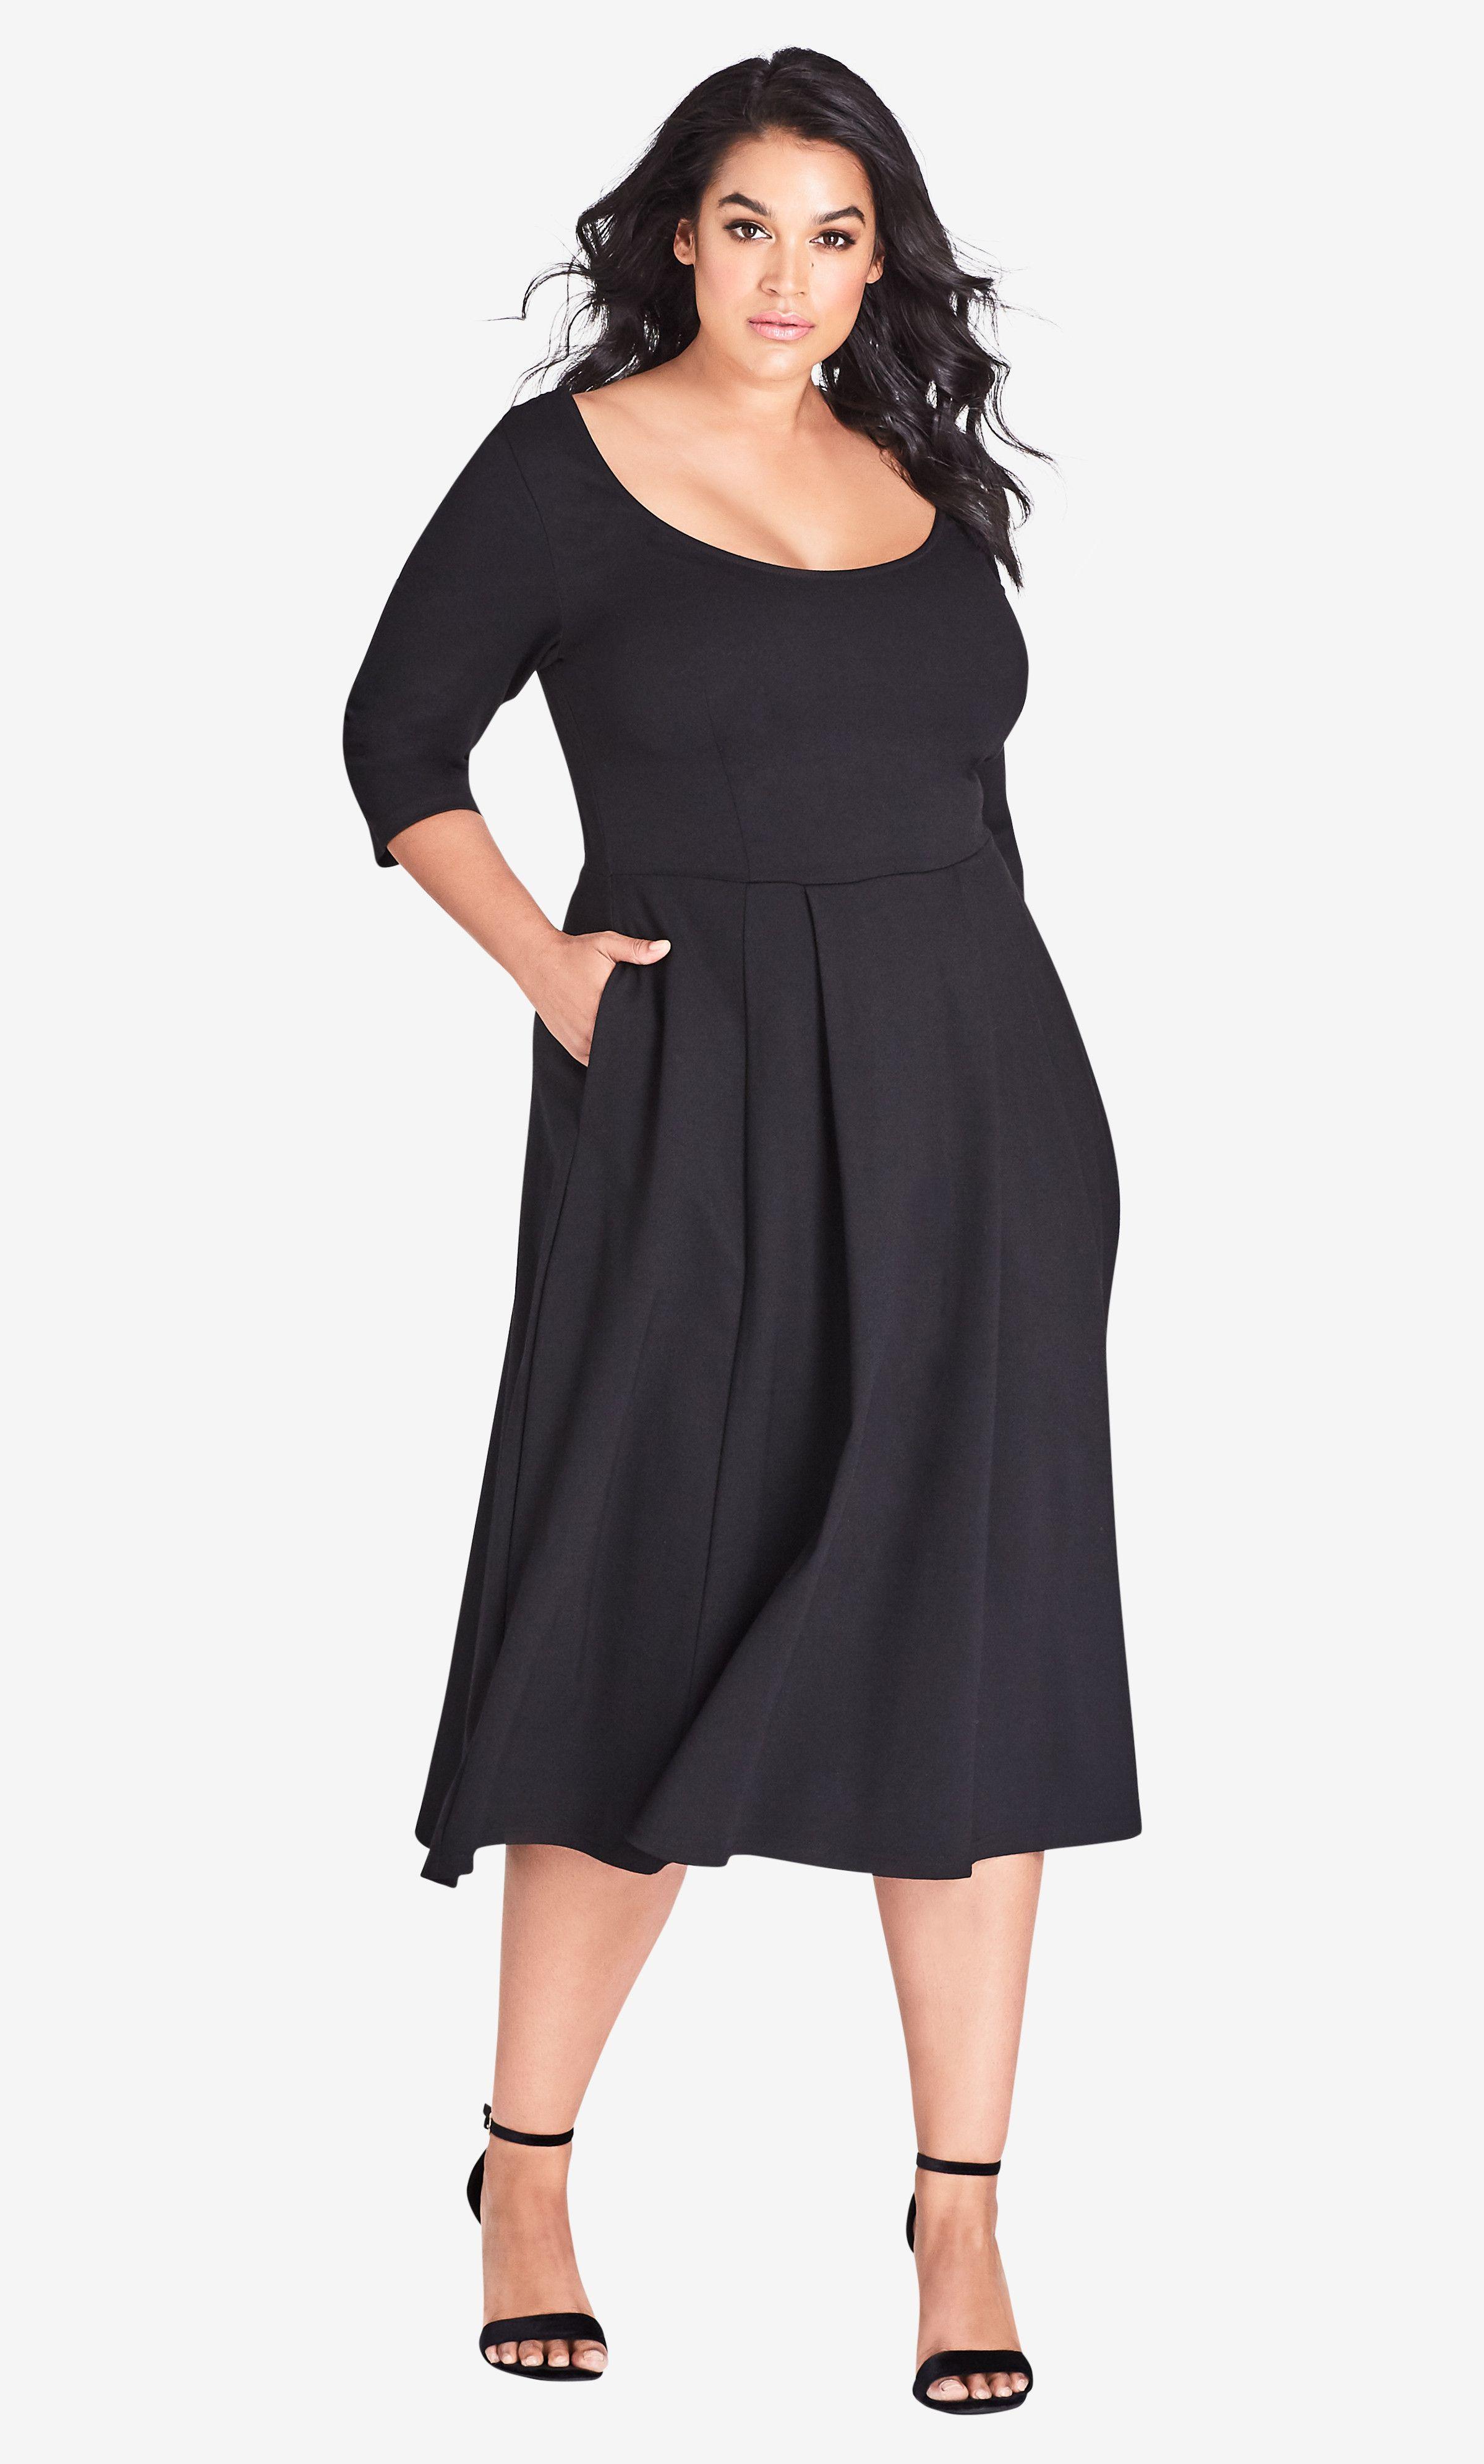 Park Art My WordPress Blog_Black Fit And Flare Dress Plus Size